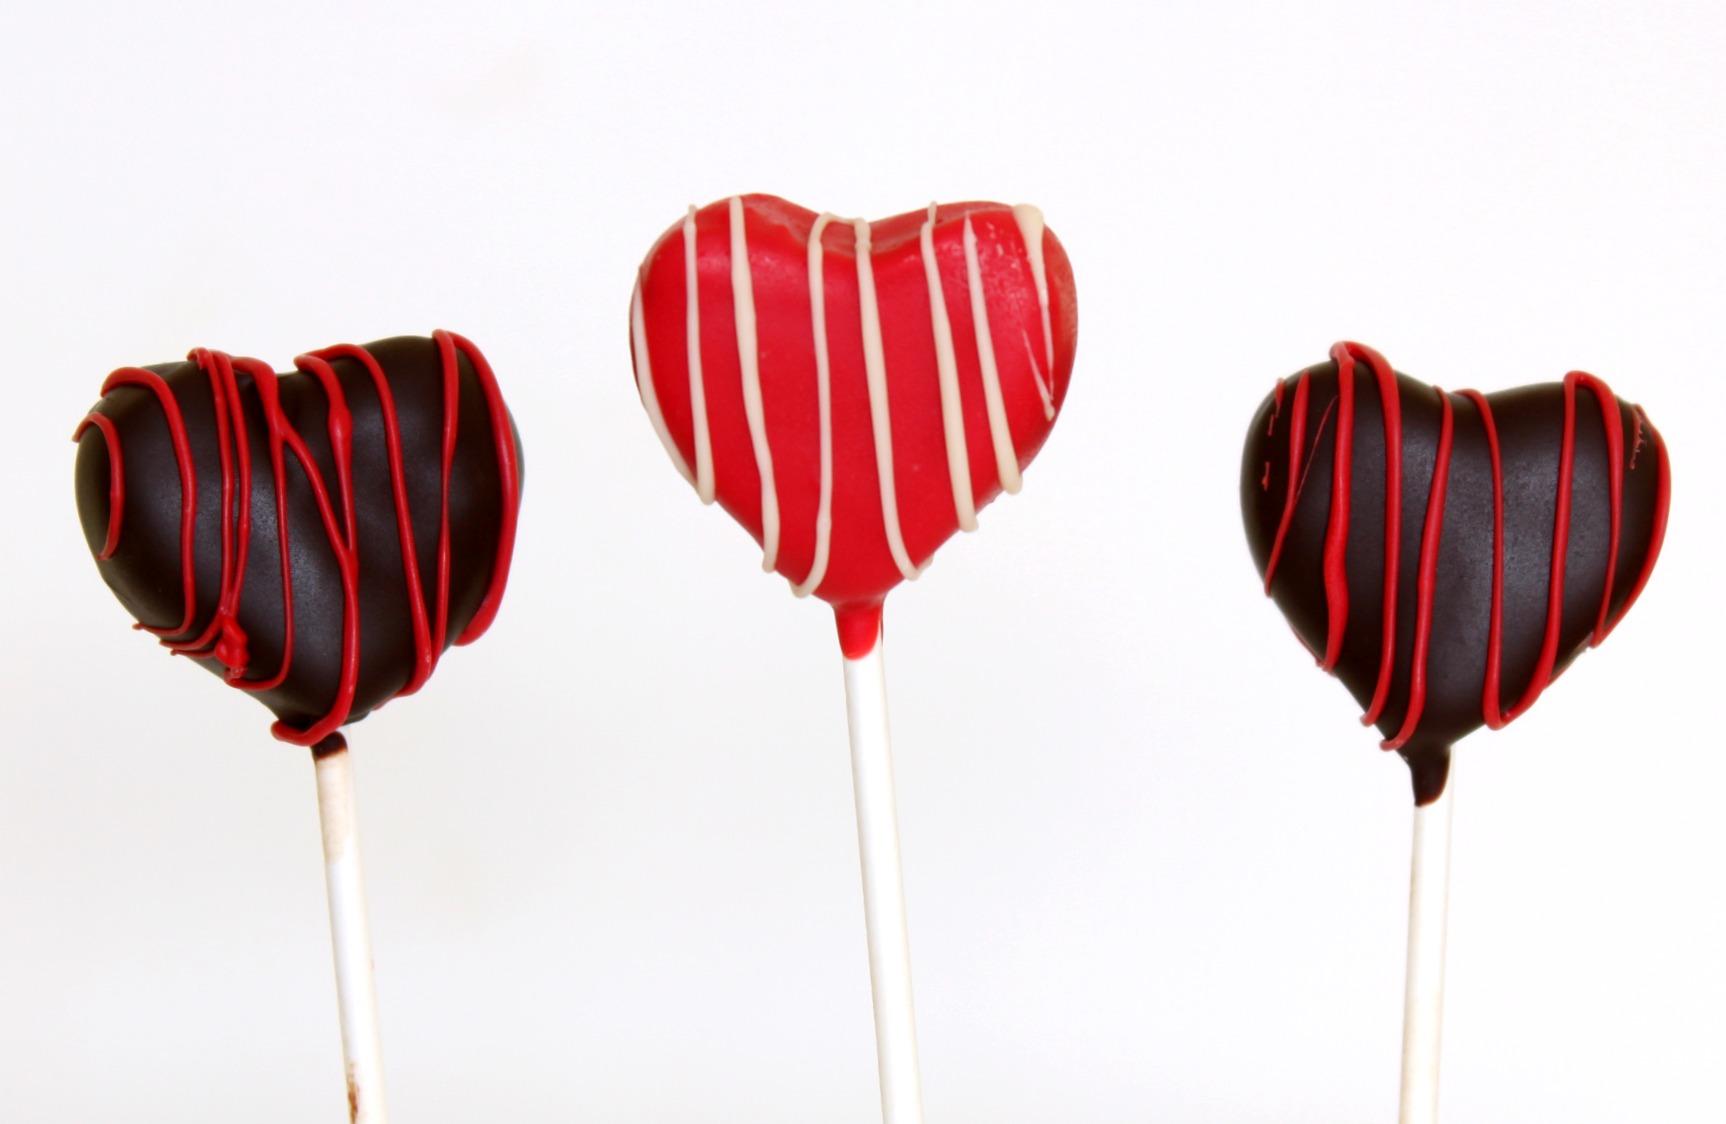 Heart shaped cake pops up